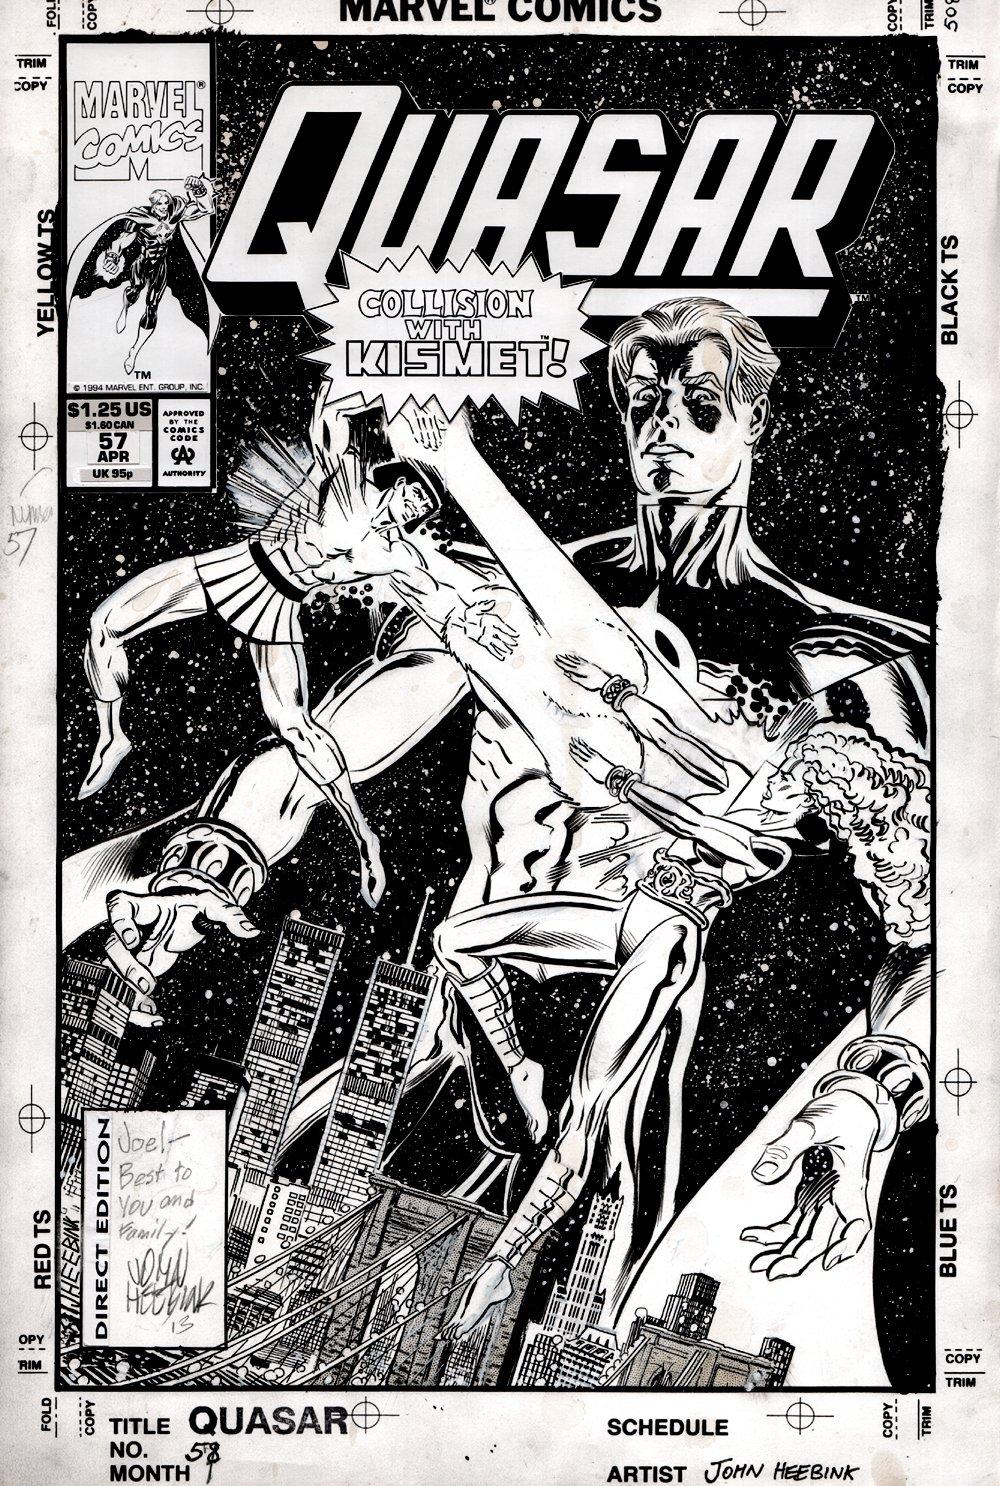 Quasar #57 Cover (Quasar, Kismet, Agent MST-3K Paragon!) 1993